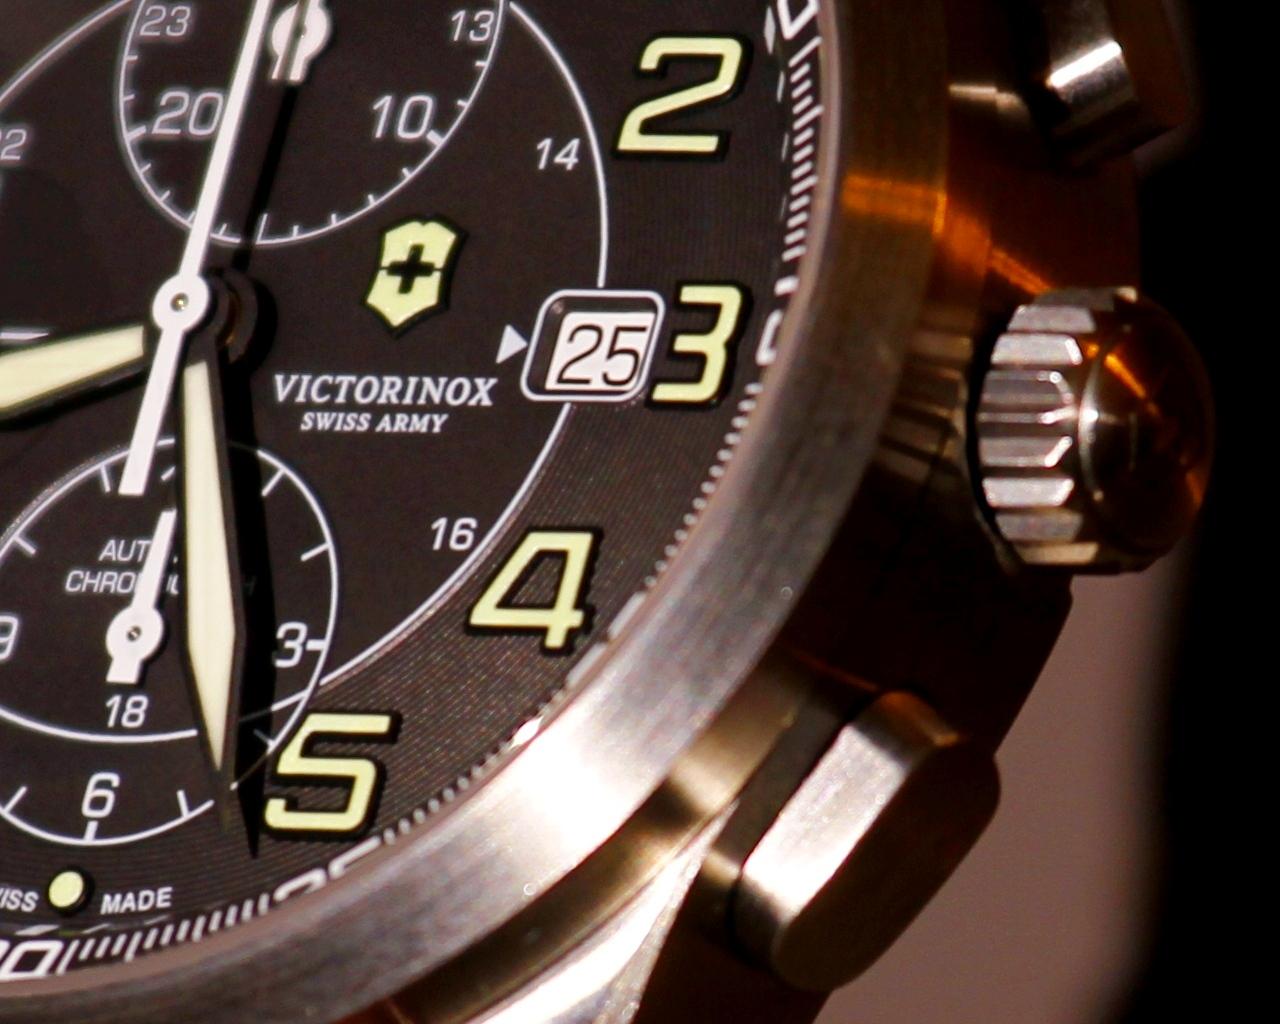 watch-test-victorinox-swiss-army-chronograph-automatic-prezzo-price-0-100_37